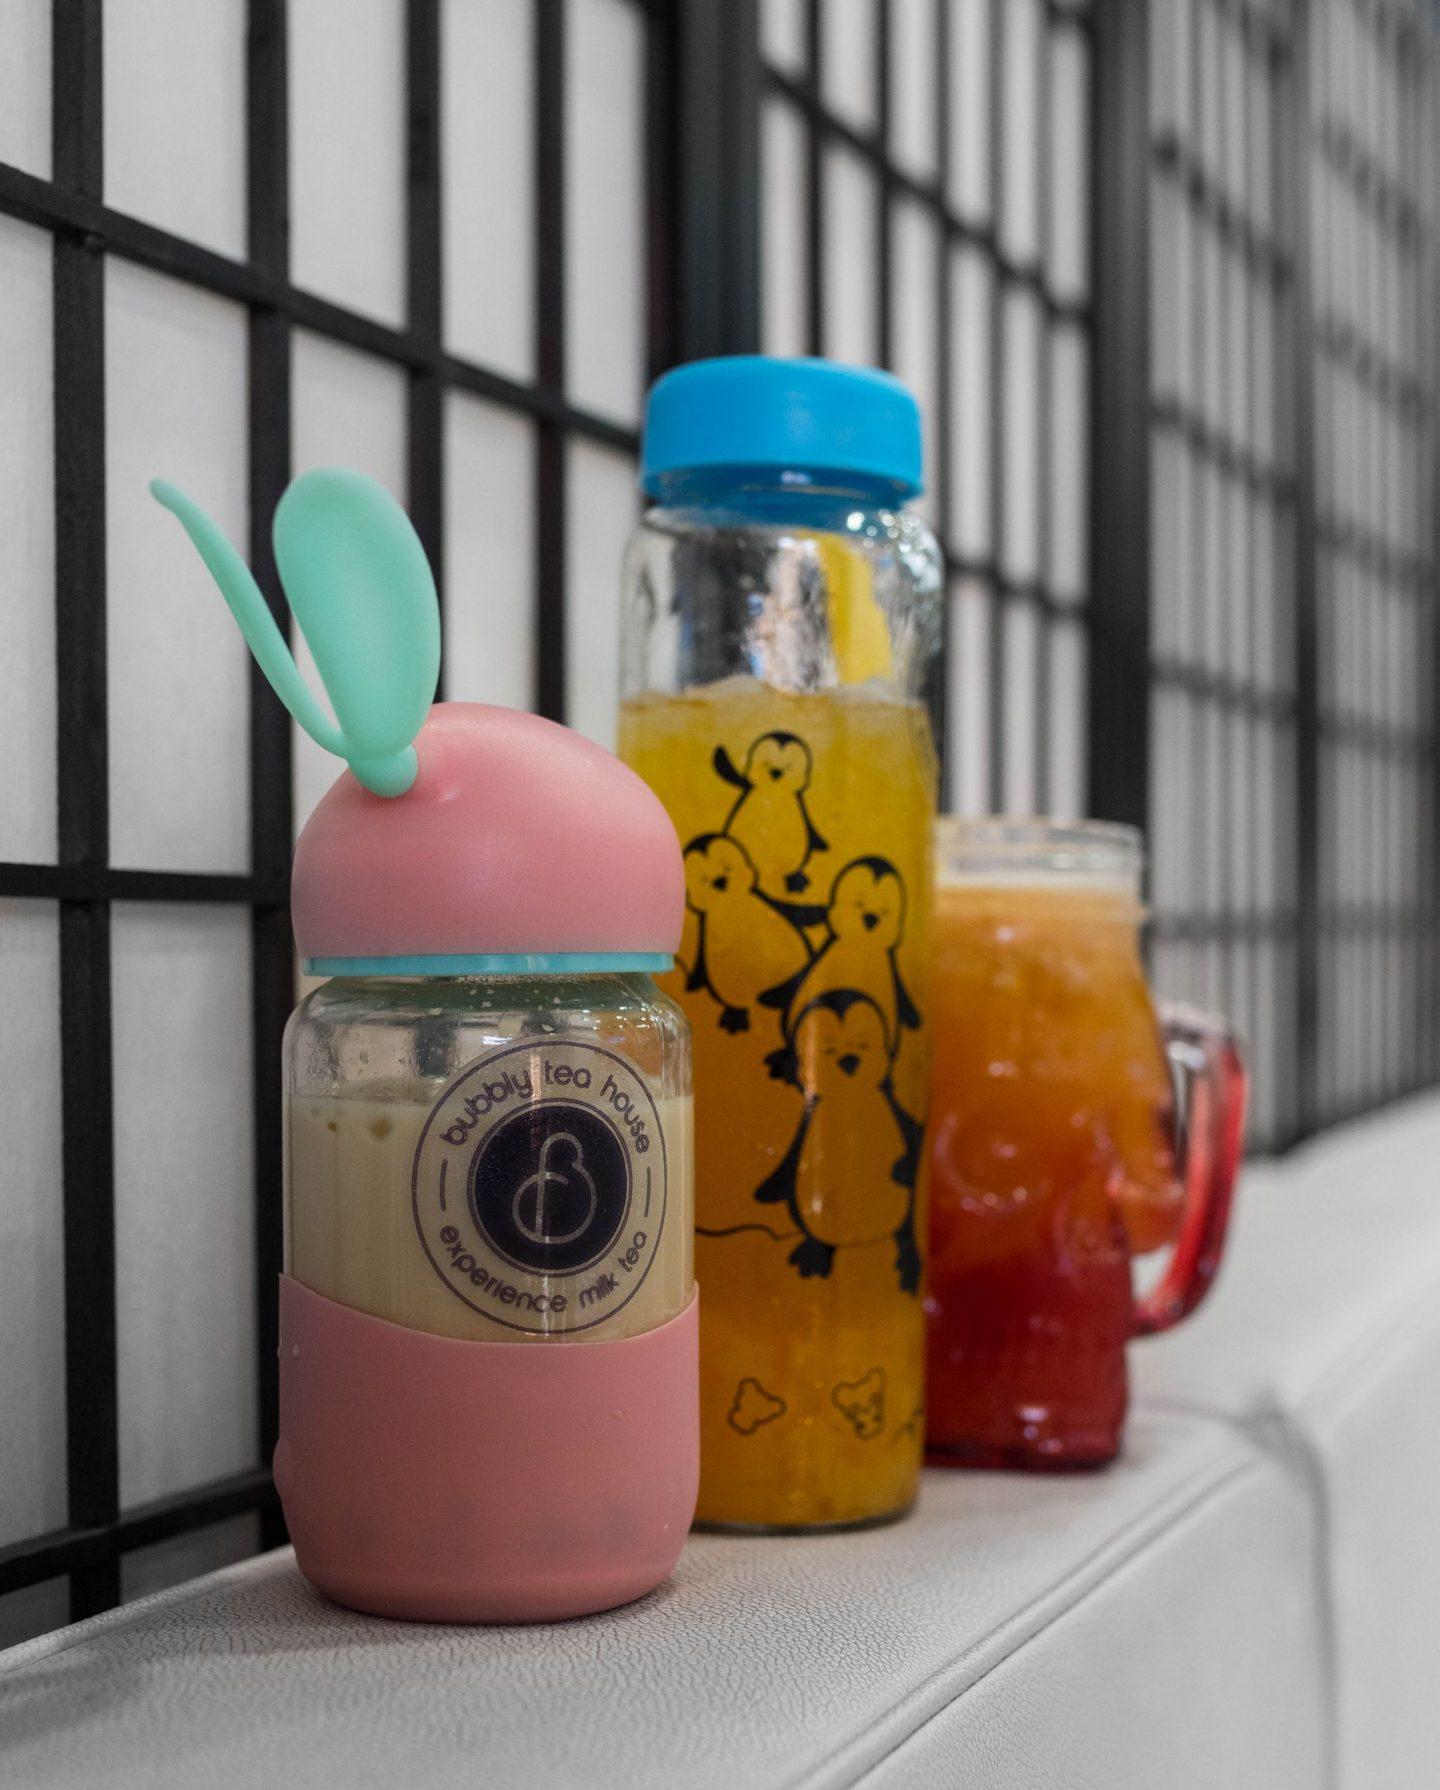 bubbly teahouse drinks